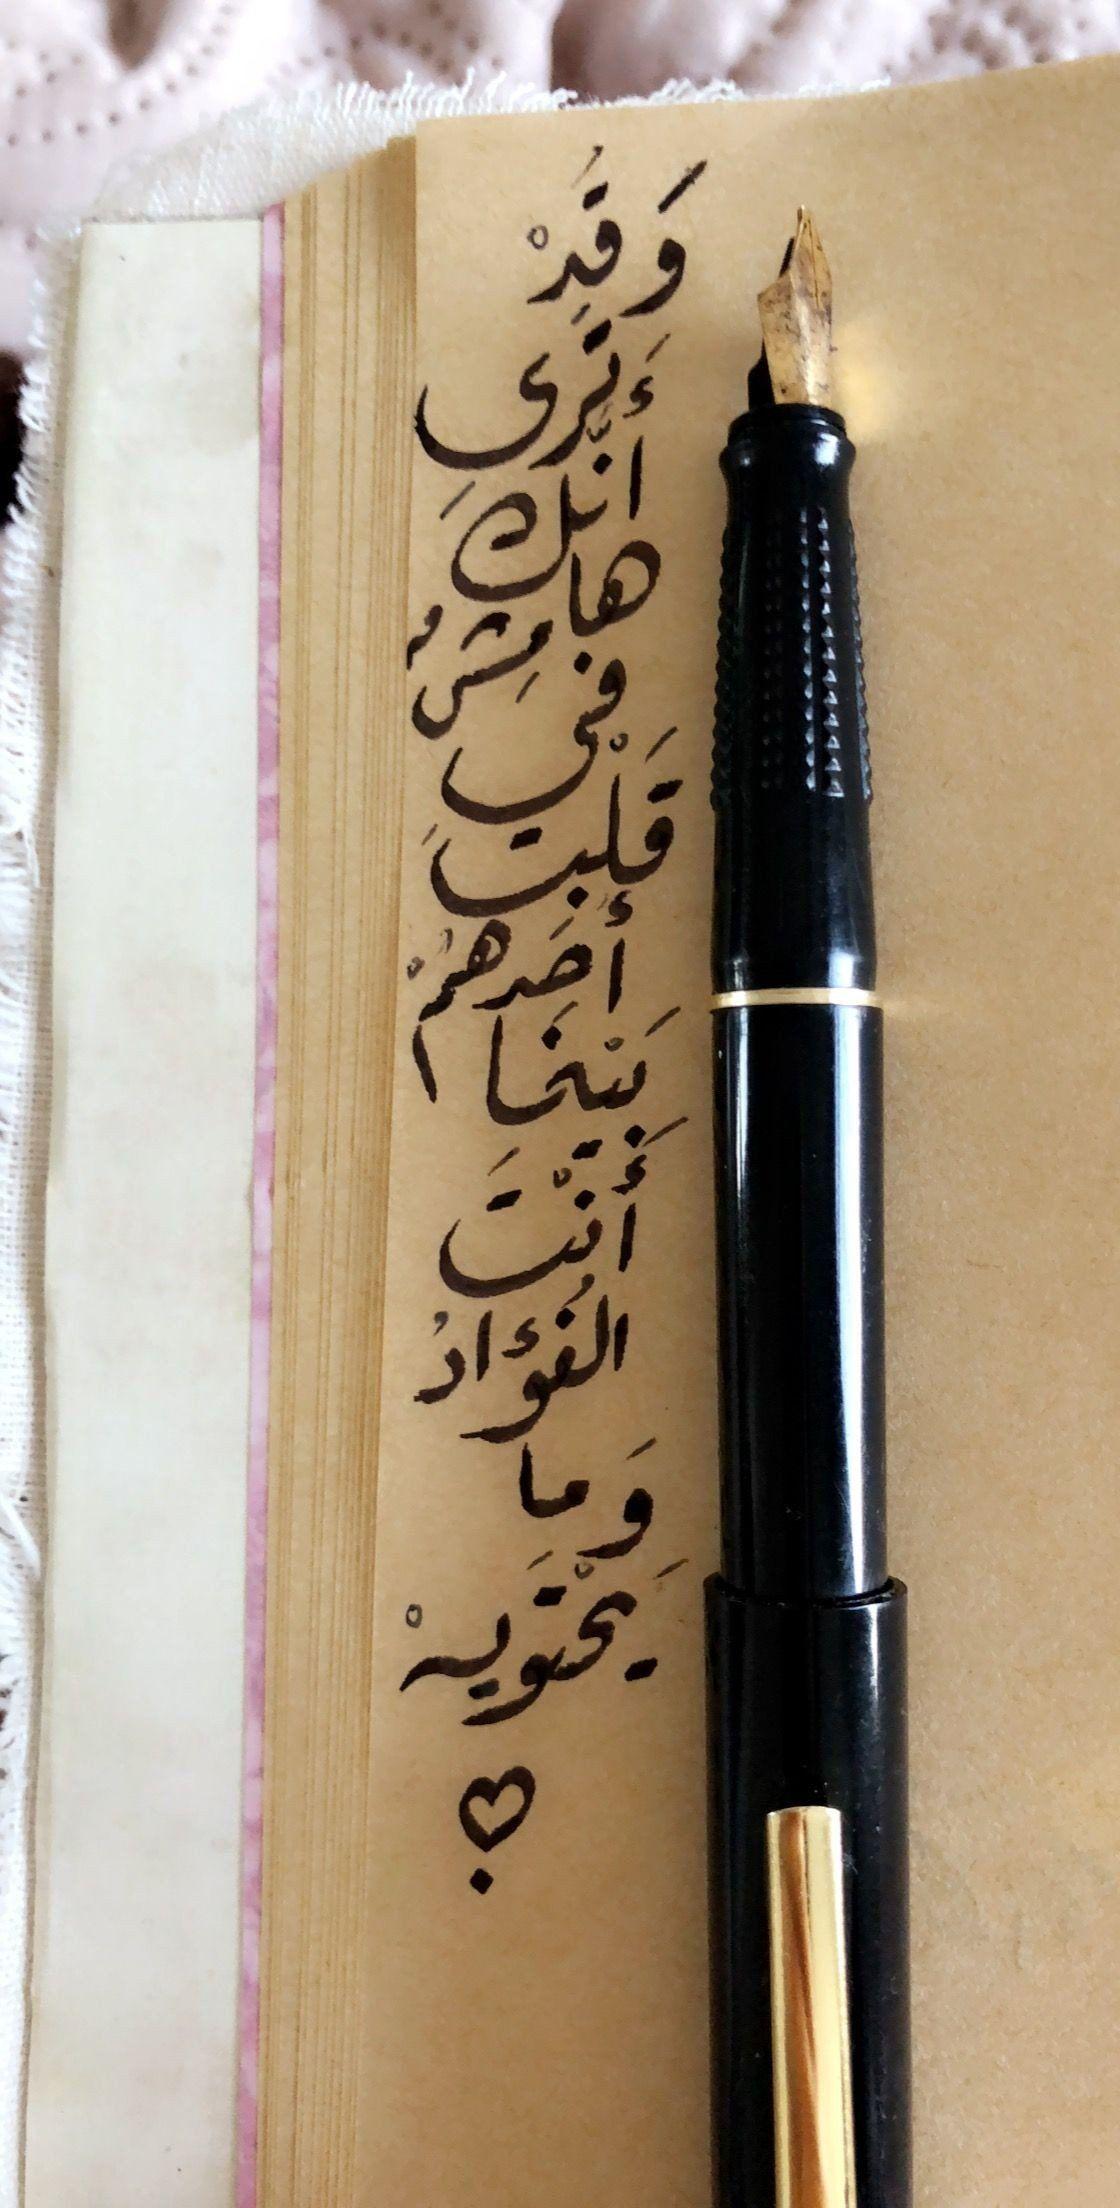 خلفيات حكم و أقوال حب فيسبوك بنات صورة ١٧ Words Quotes Quotes For Book Lovers Arabic Quotes